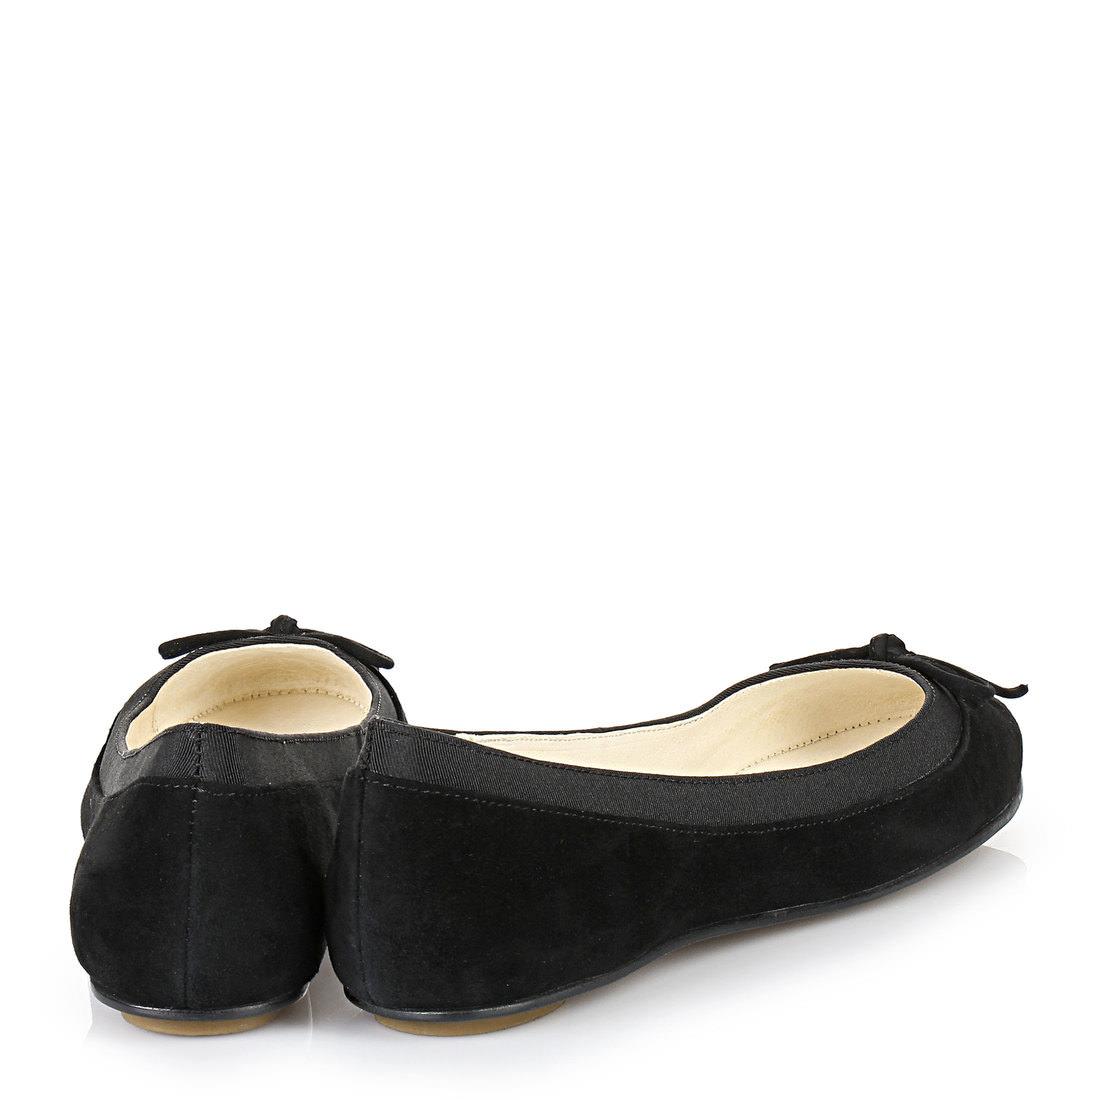 buffalo ballerina in schwarz online kaufen buffalo. Black Bedroom Furniture Sets. Home Design Ideas